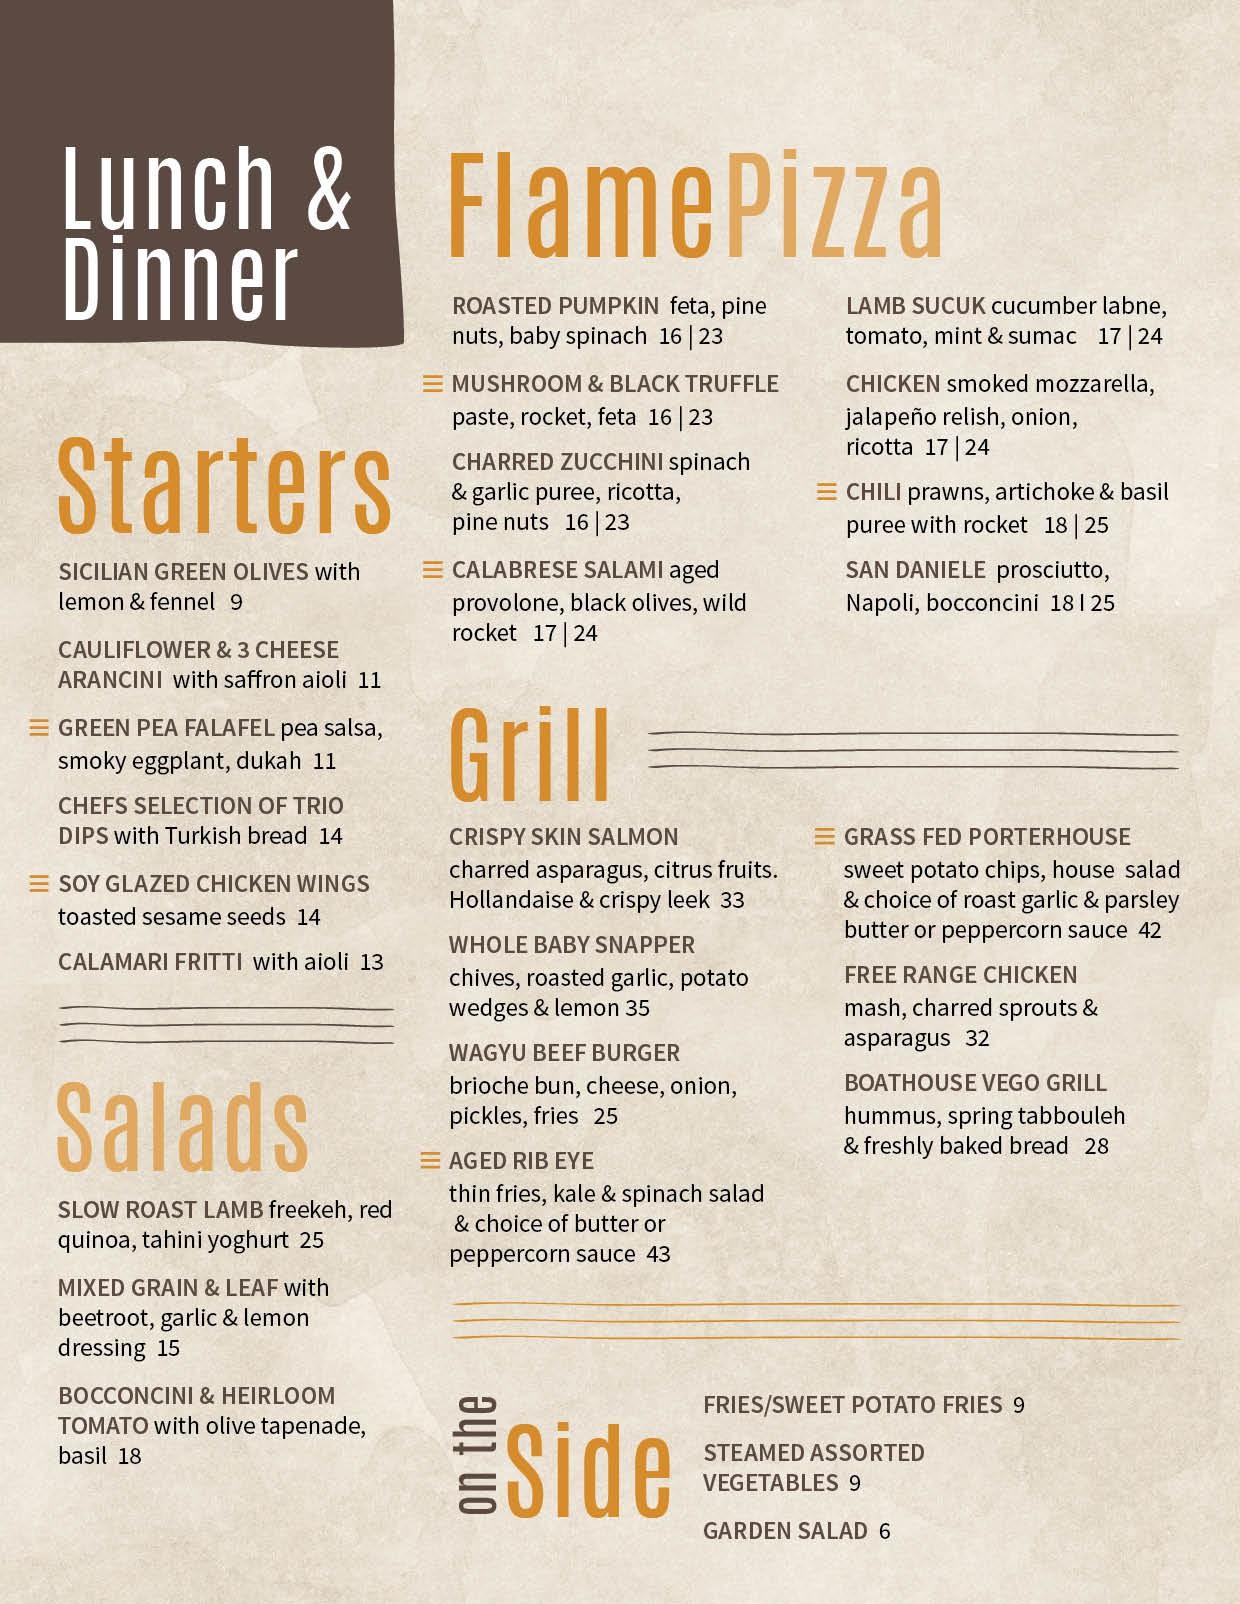 Design a new menu for iconic riverside cafe/restaurant